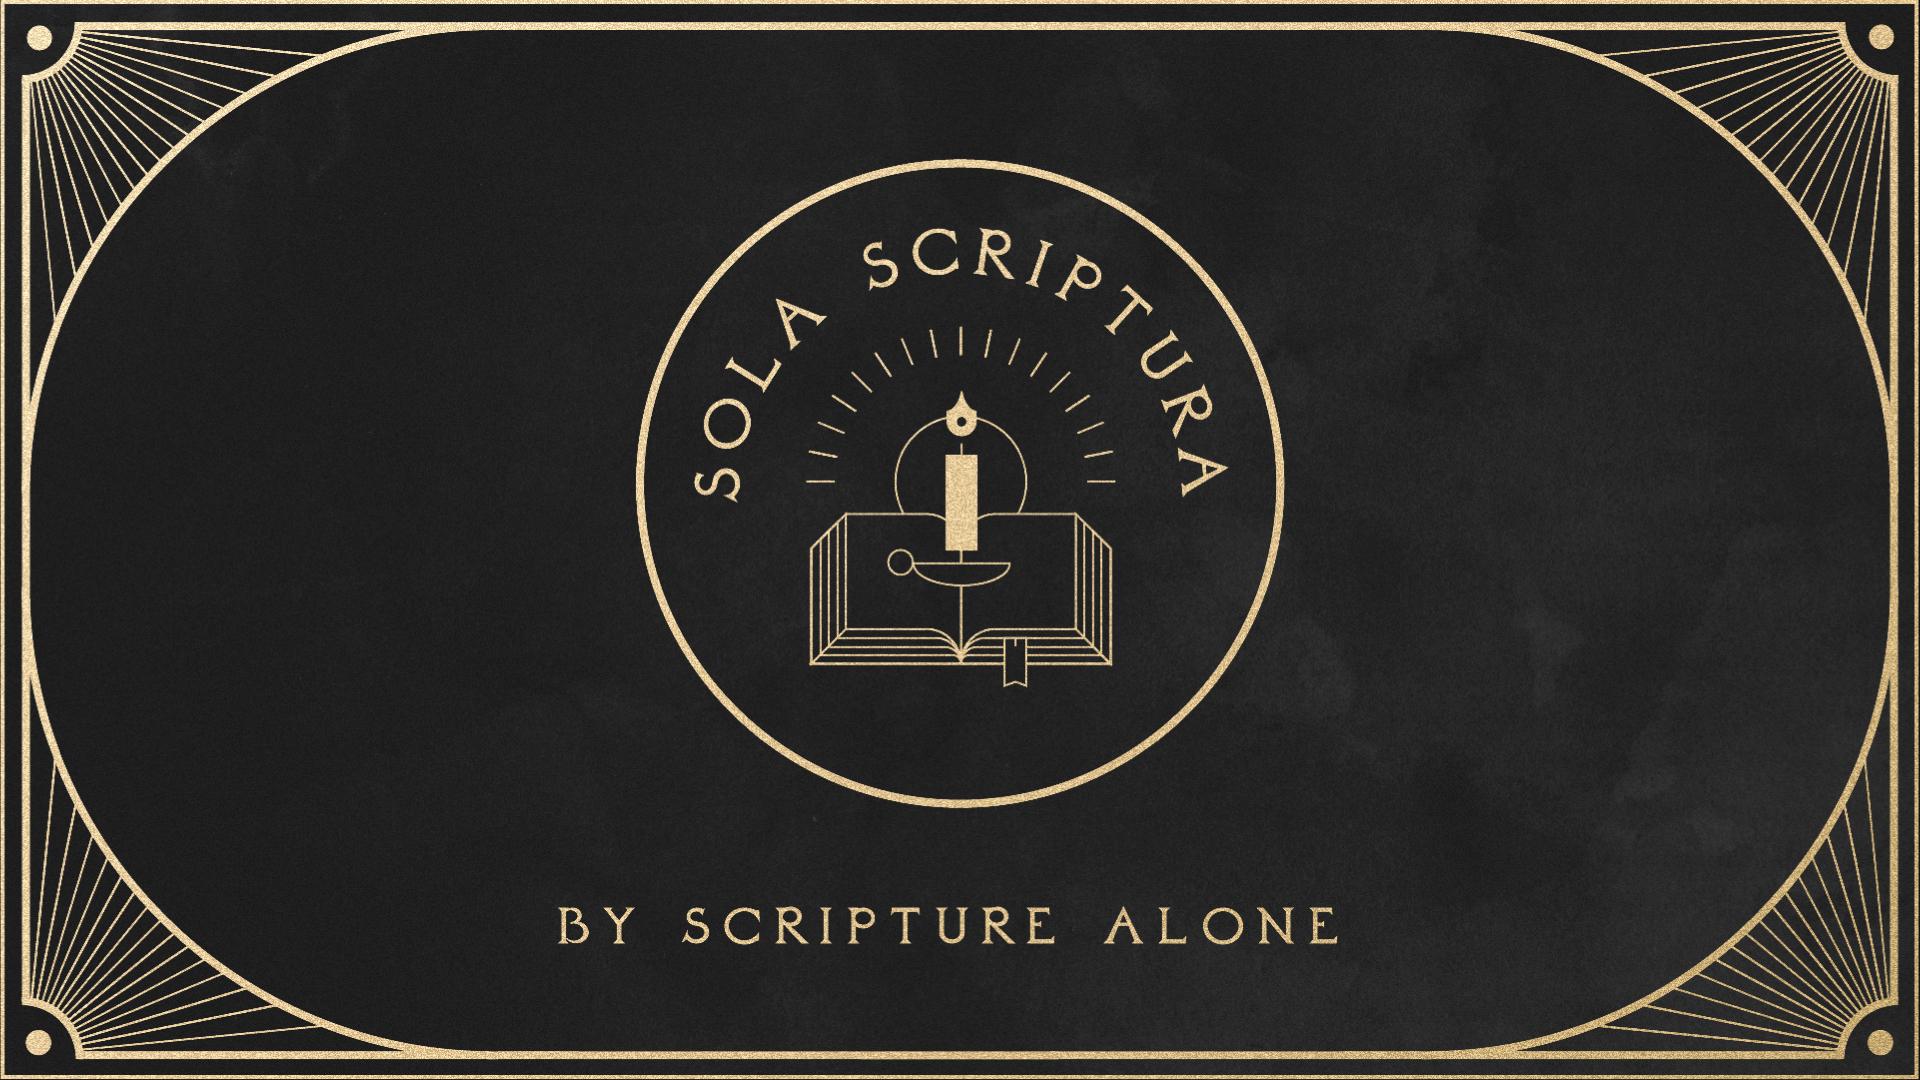 scriptura_slides.002.jpeg